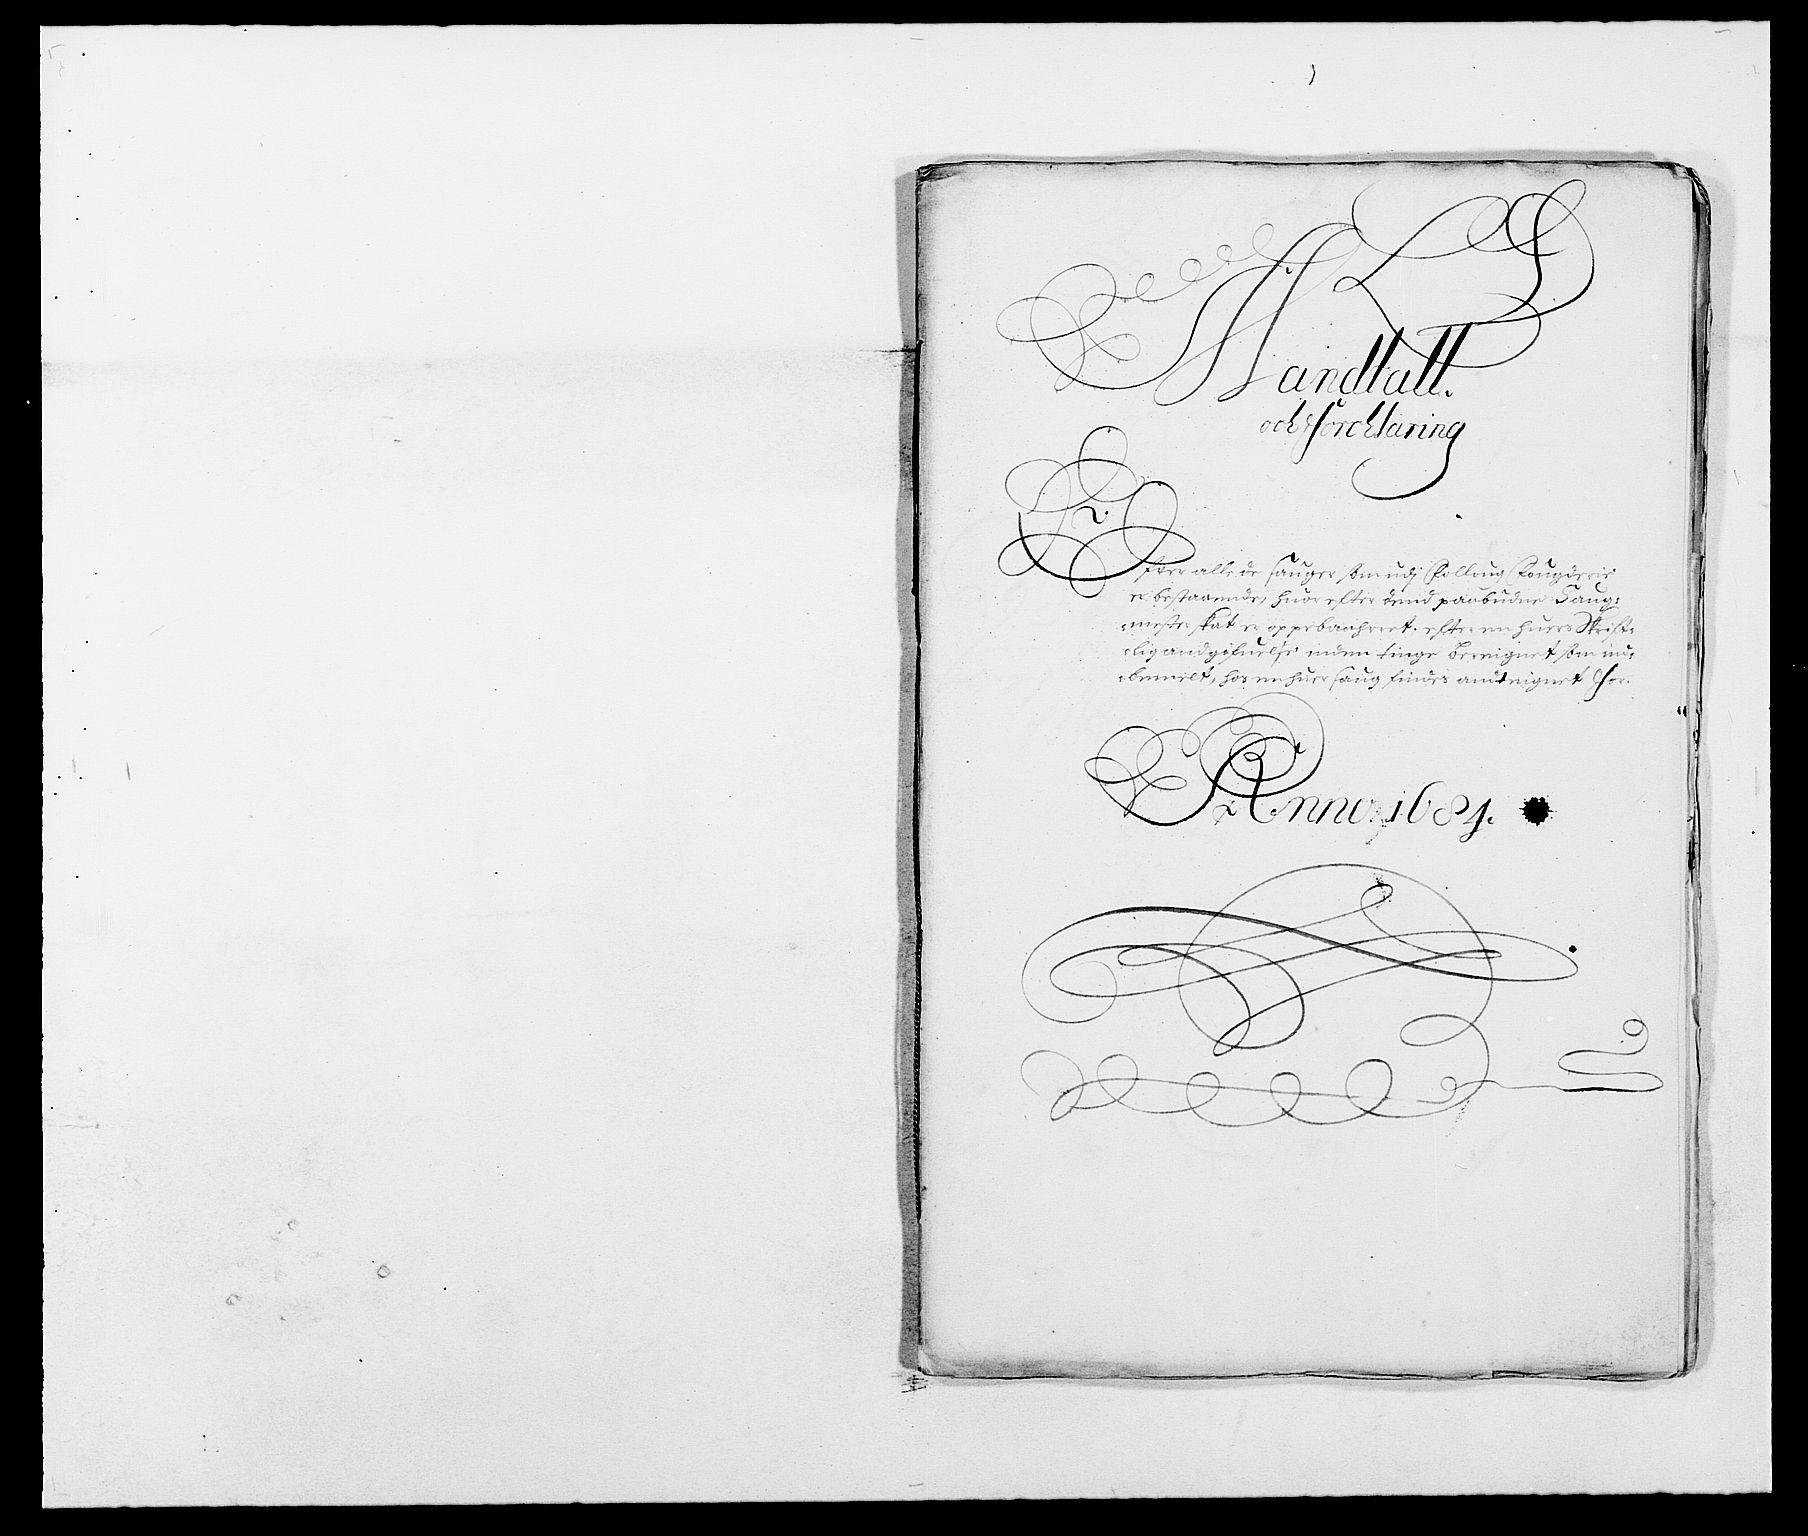 RA, Rentekammeret inntil 1814, Reviderte regnskaper, Fogderegnskap, R09/L0431: Fogderegnskap Follo, 1684, s. 165